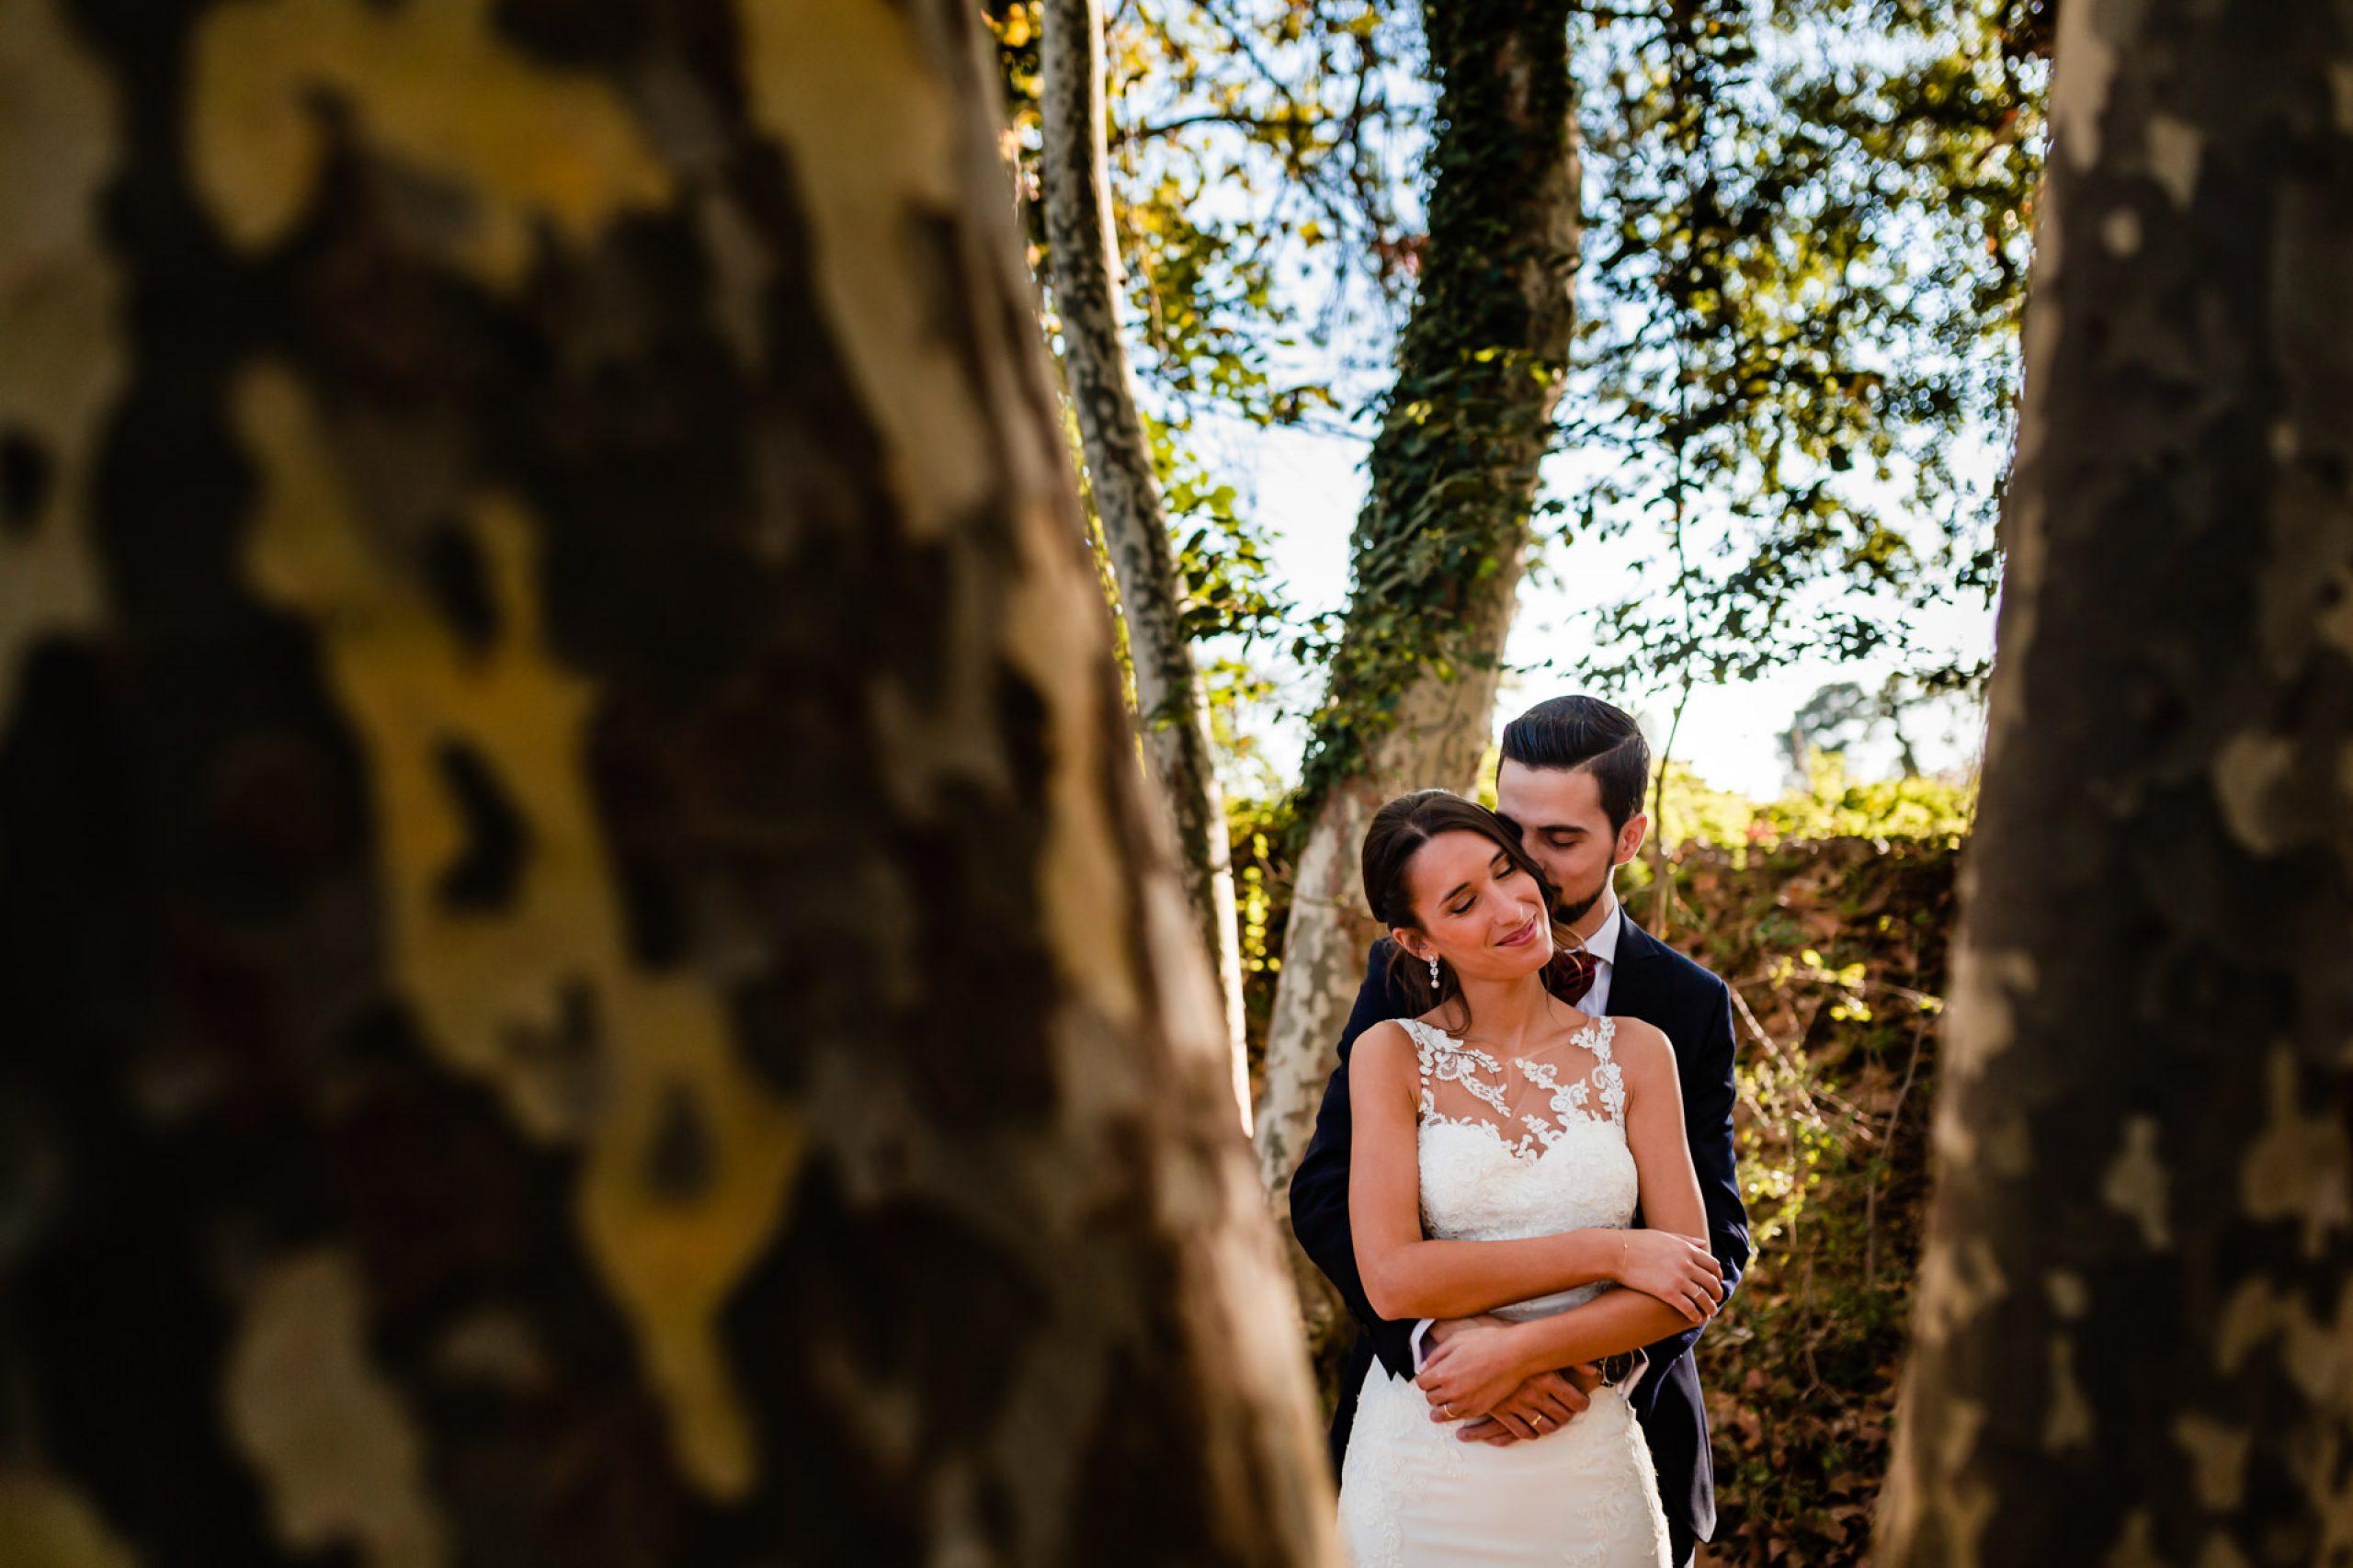 LuzdeBarcelona-postboda-boda-fotografo-cerdanyola-18